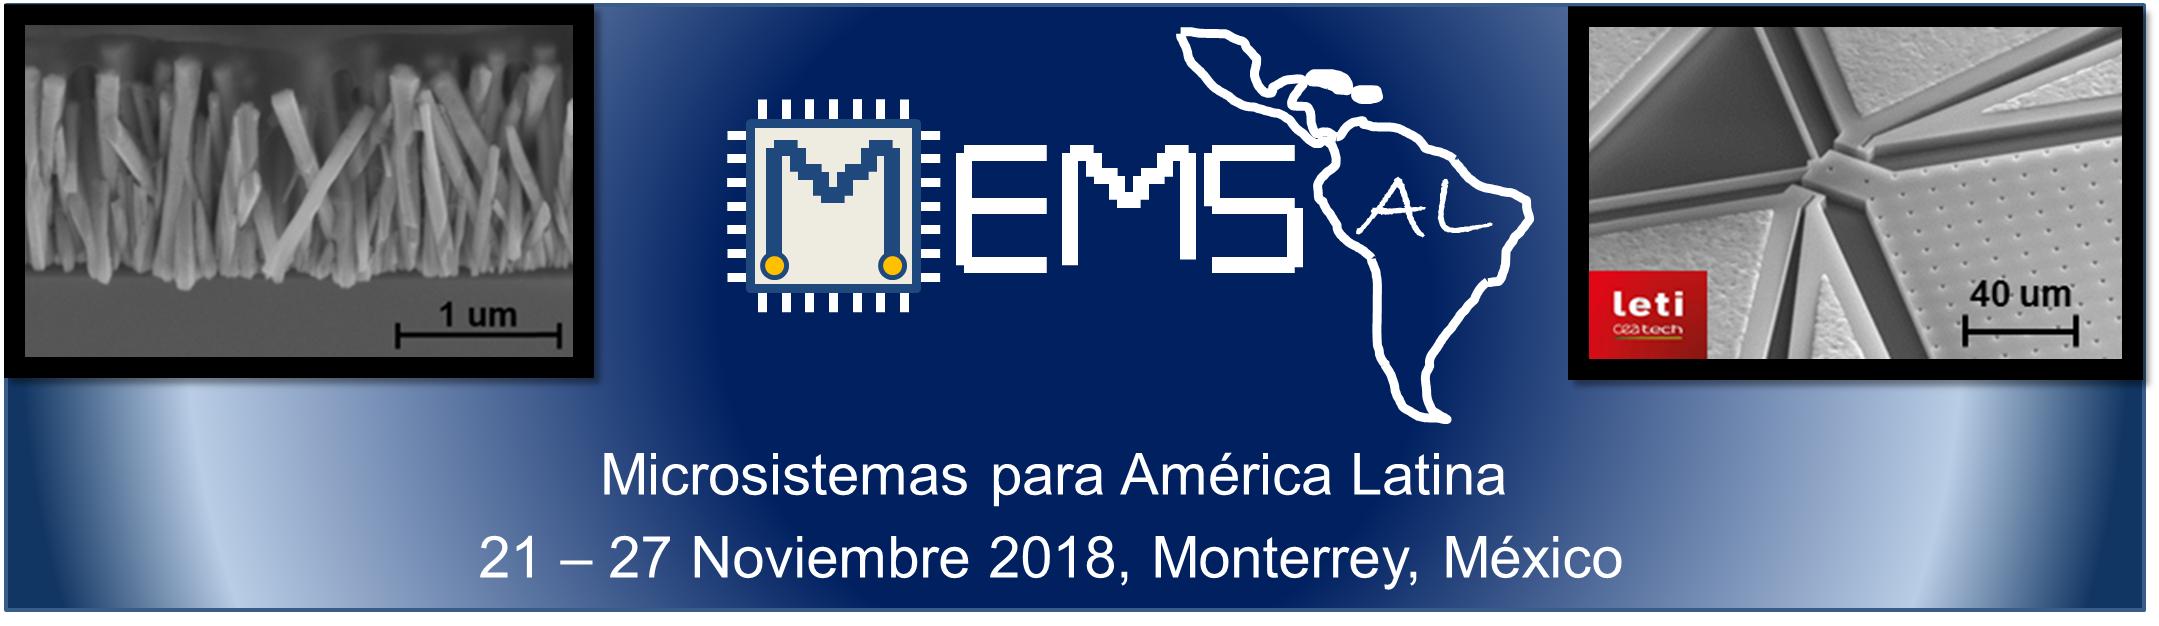 MEMS-Al Microsistemas para América Latina  21-2 Noviembre 2018